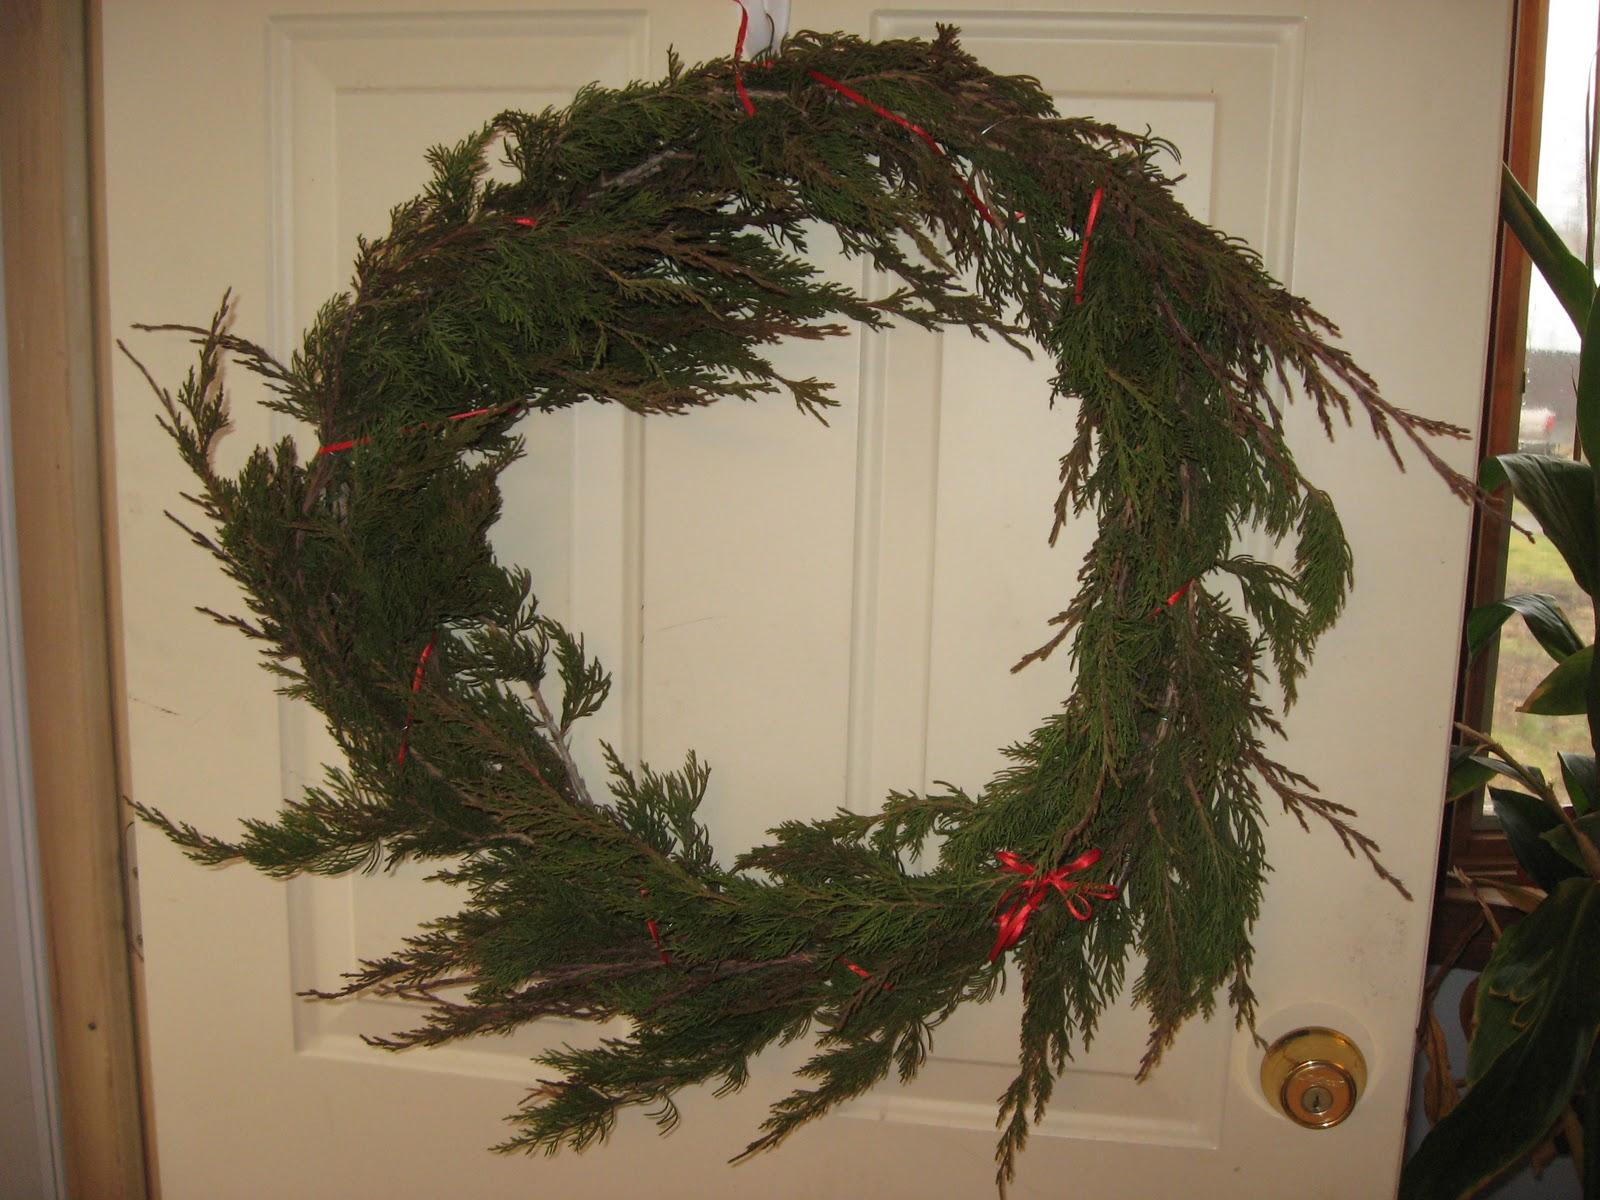 Wild Rose Pastures Handmade Gift Exchange And Xmas Wreath